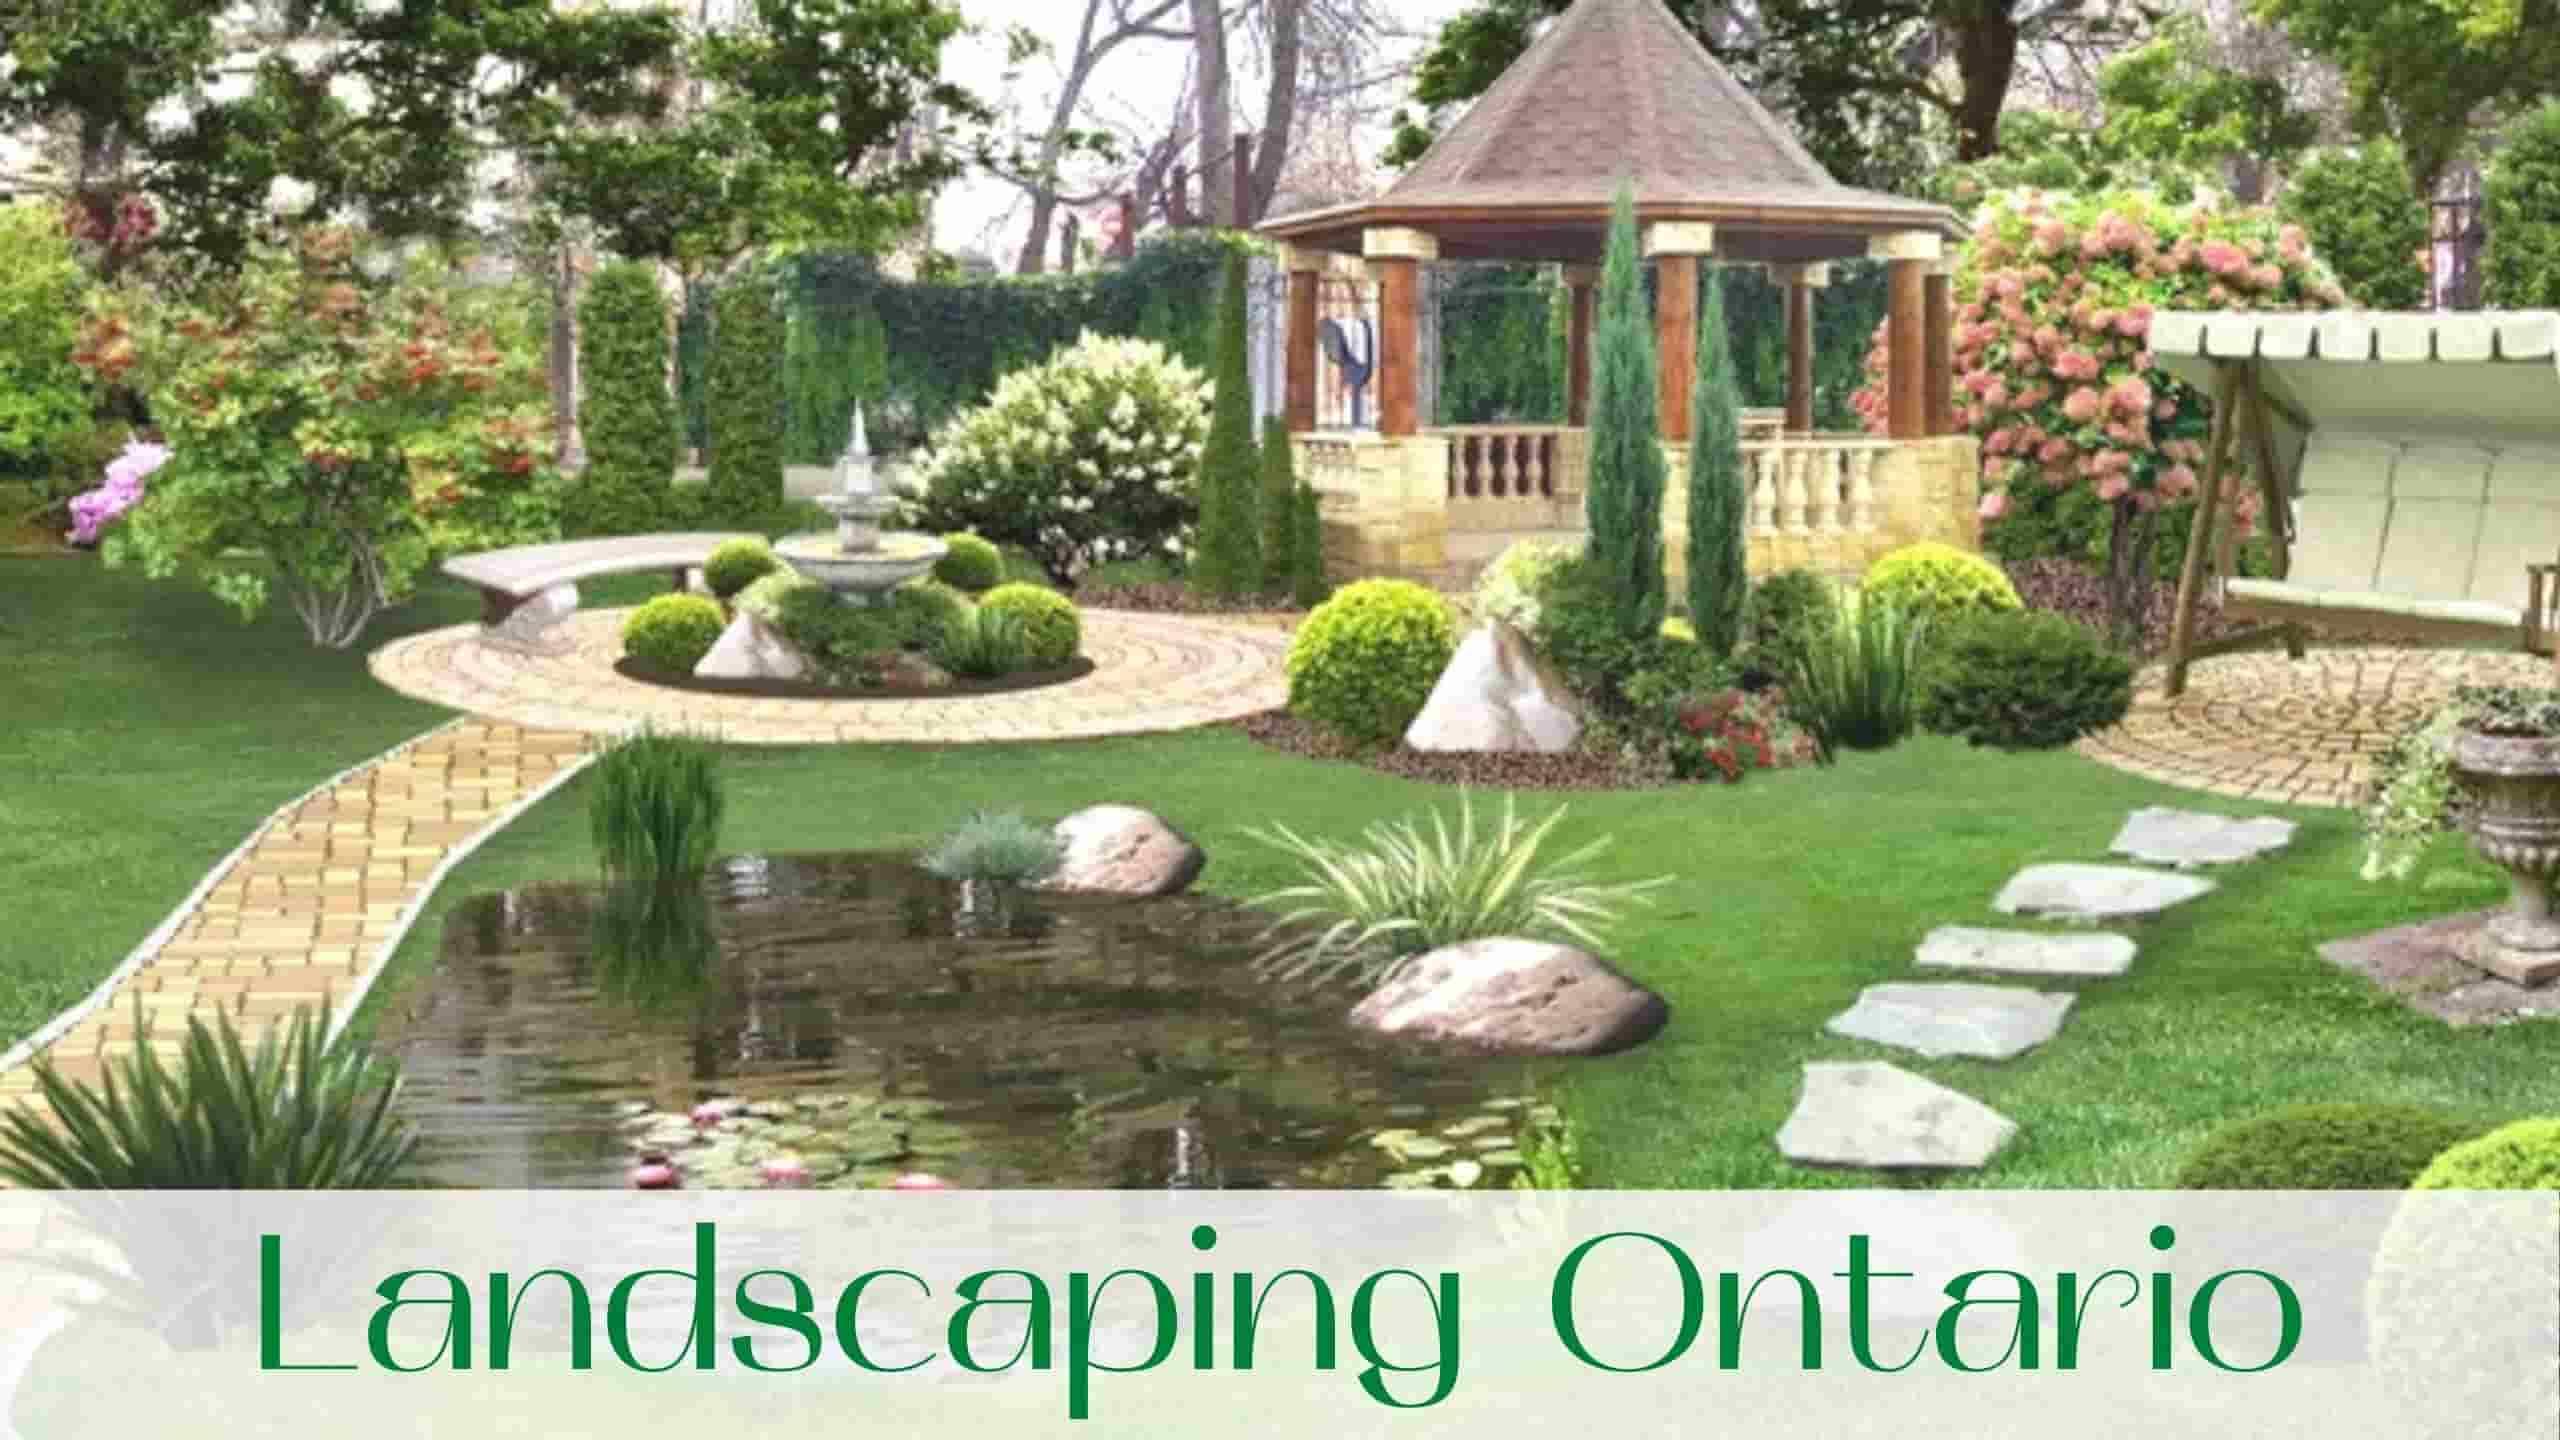 image-Landscaping-Ontario